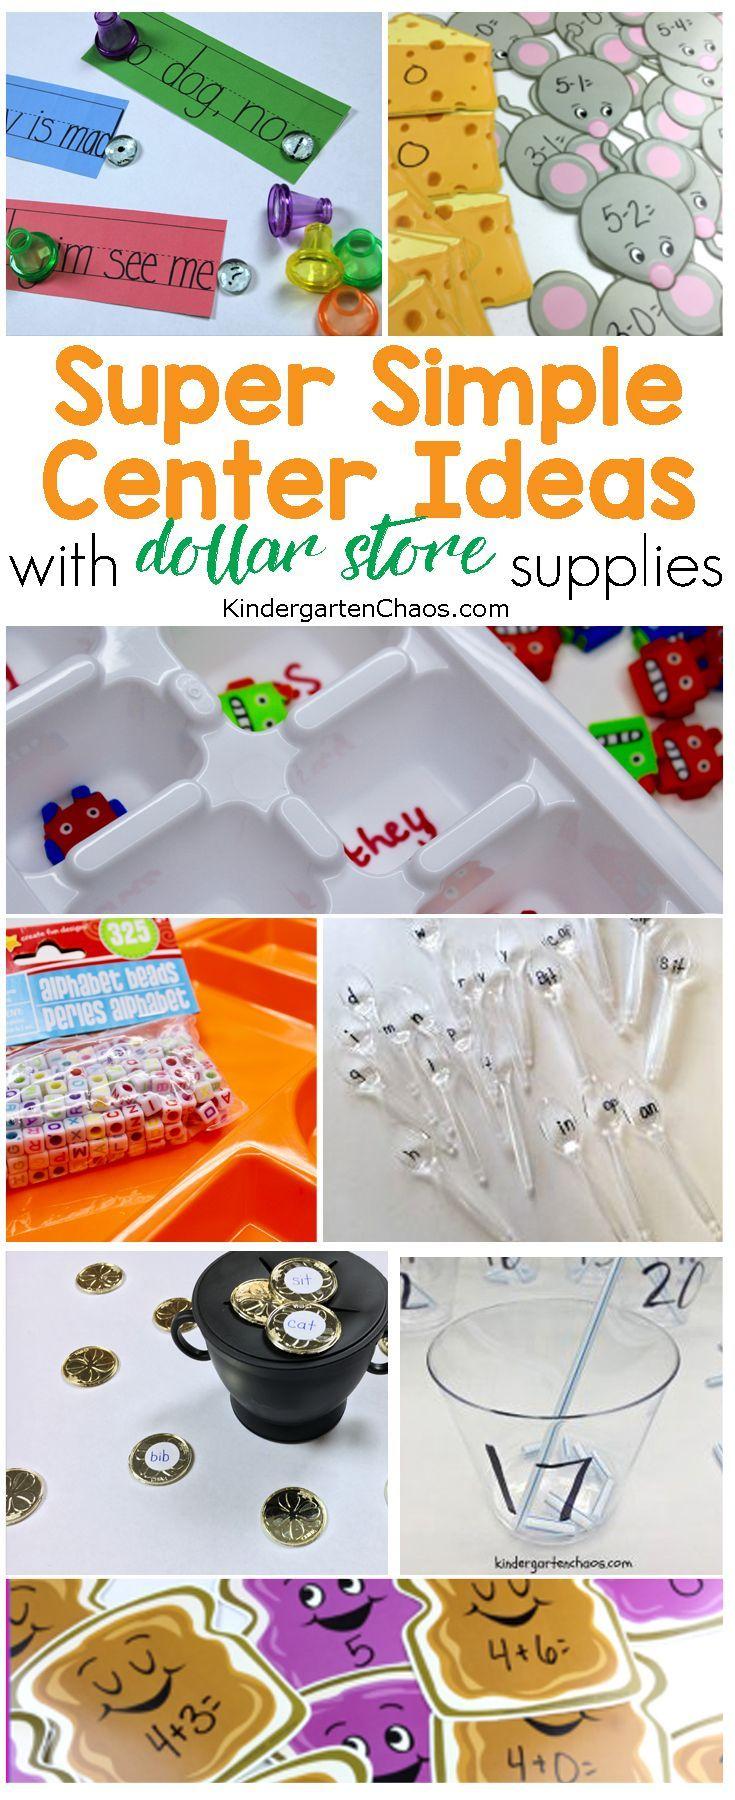 Super Fun Kinder Center Ideas With Dollar Store Supplies